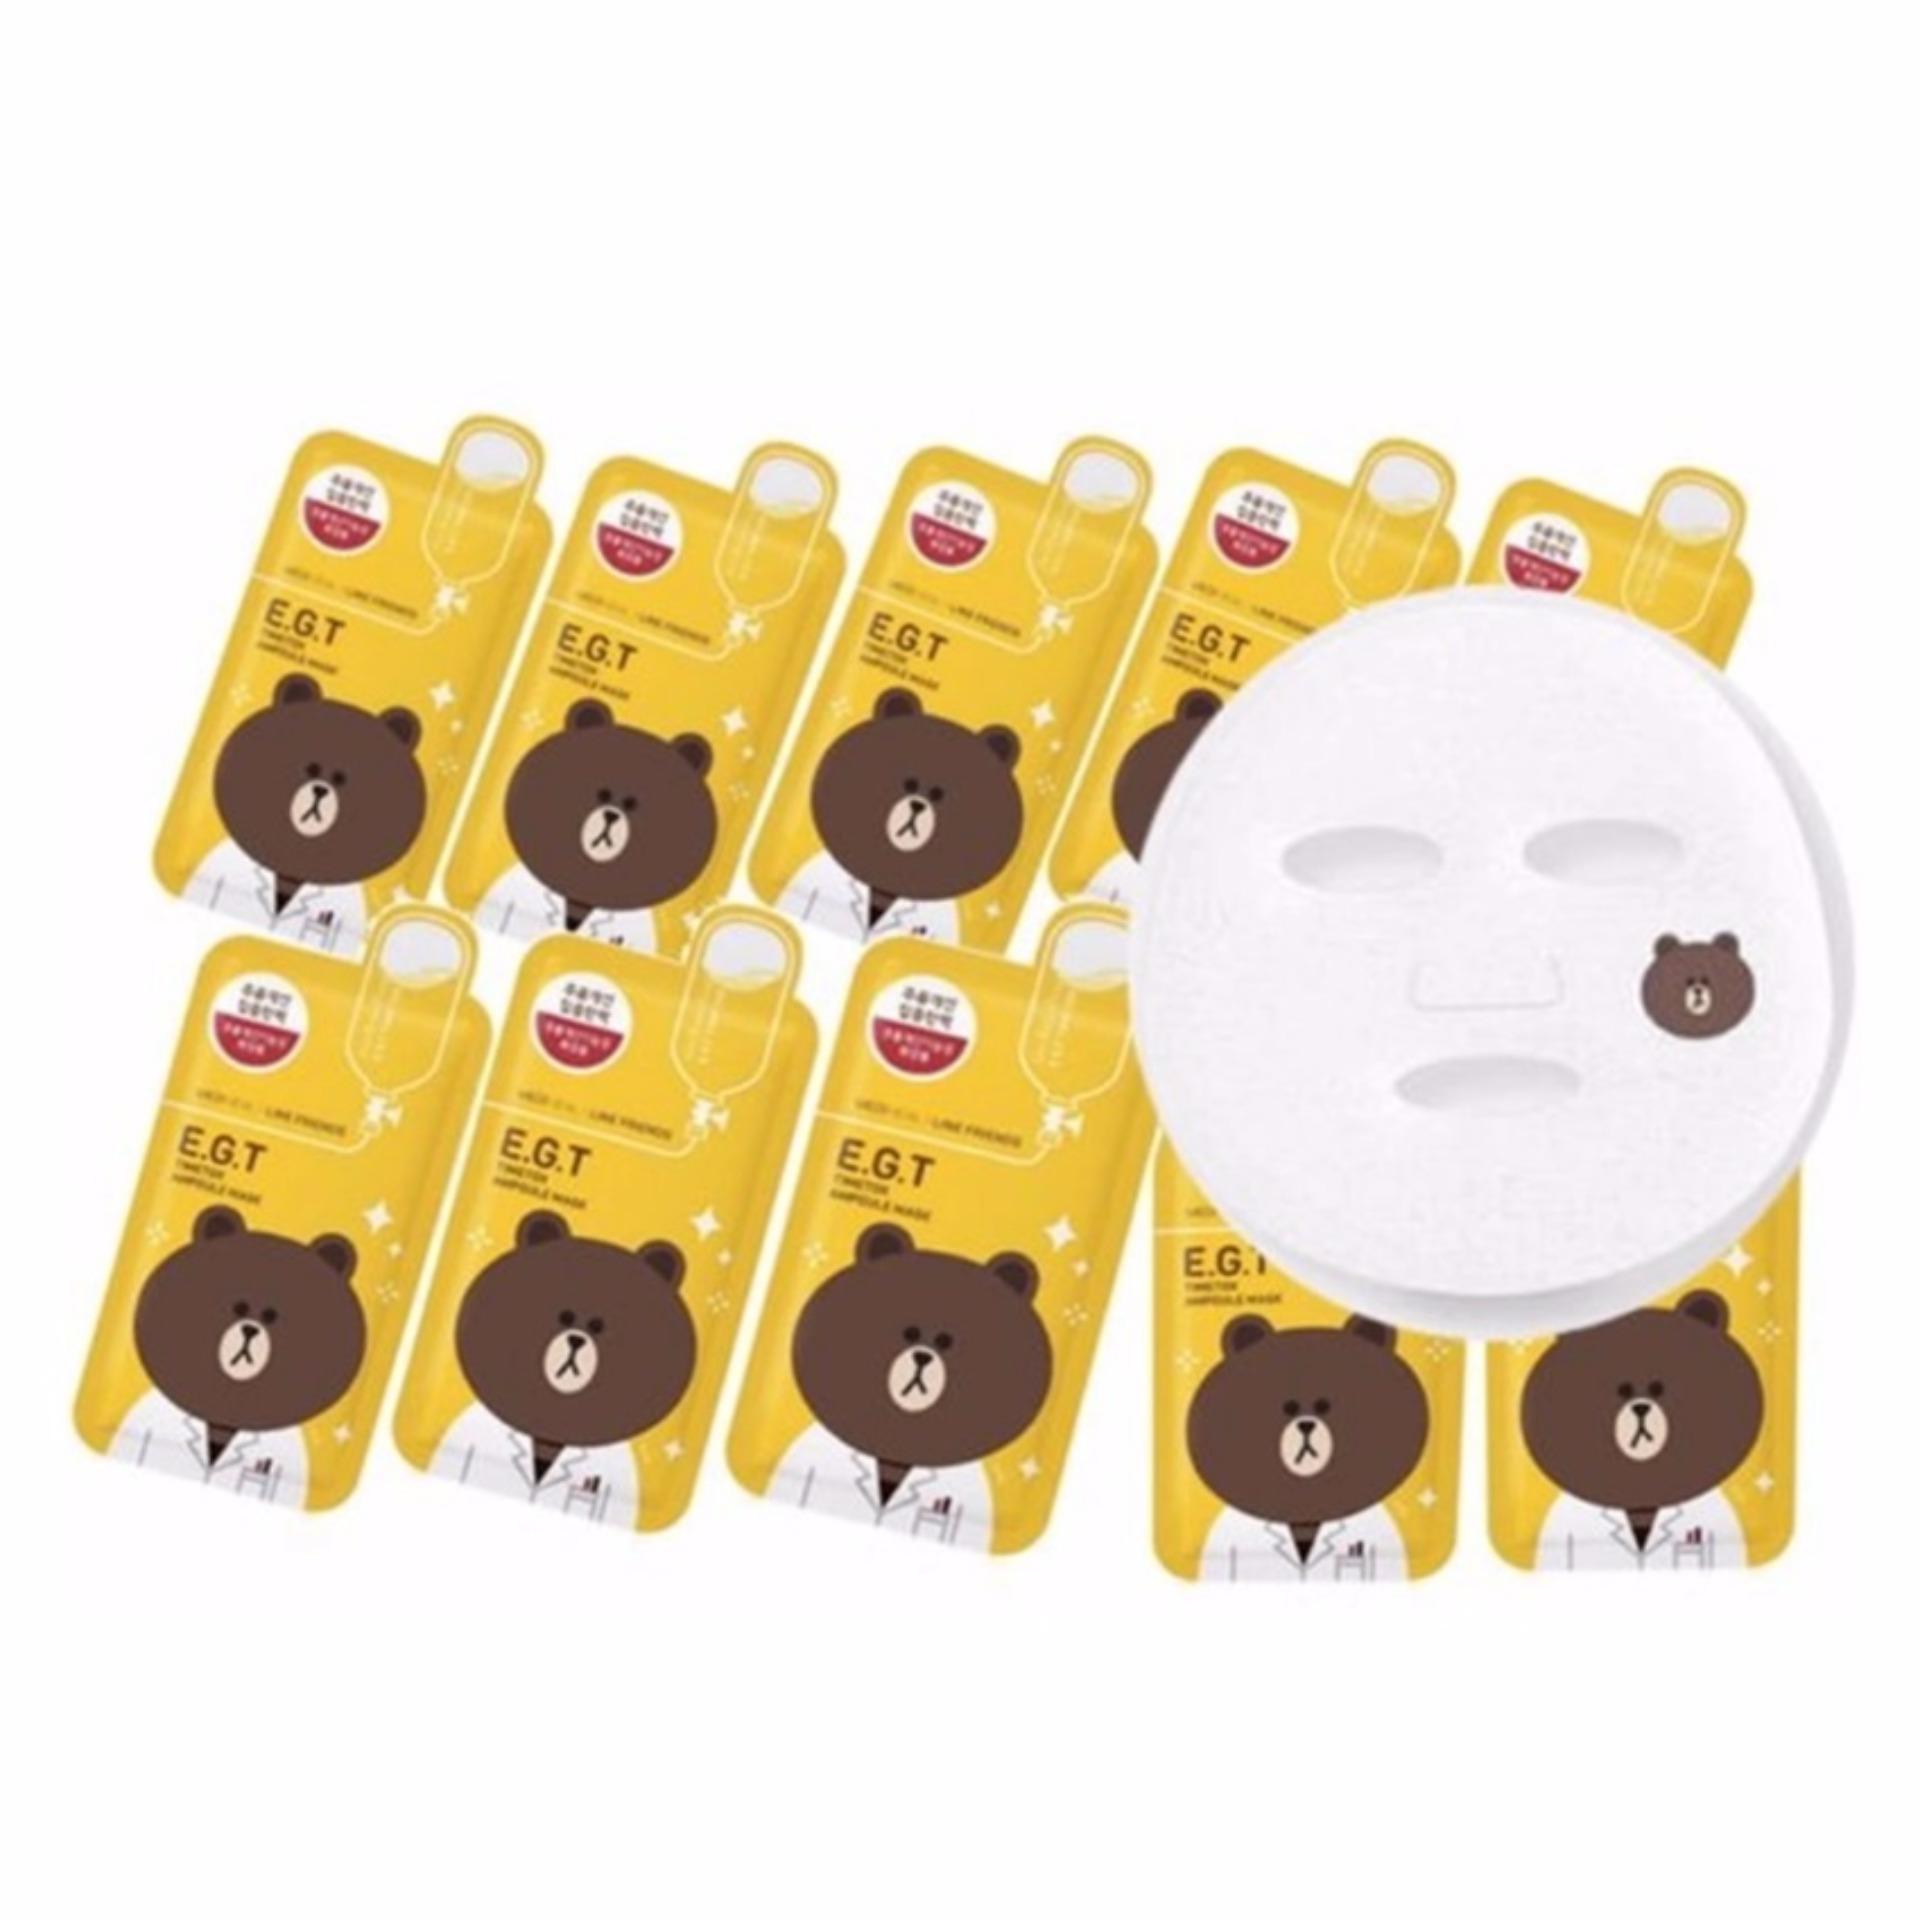 Buy Mediheal Line Friends Egt Timetox Ampoule Mask Pack 25ml10ea Intl Singapore